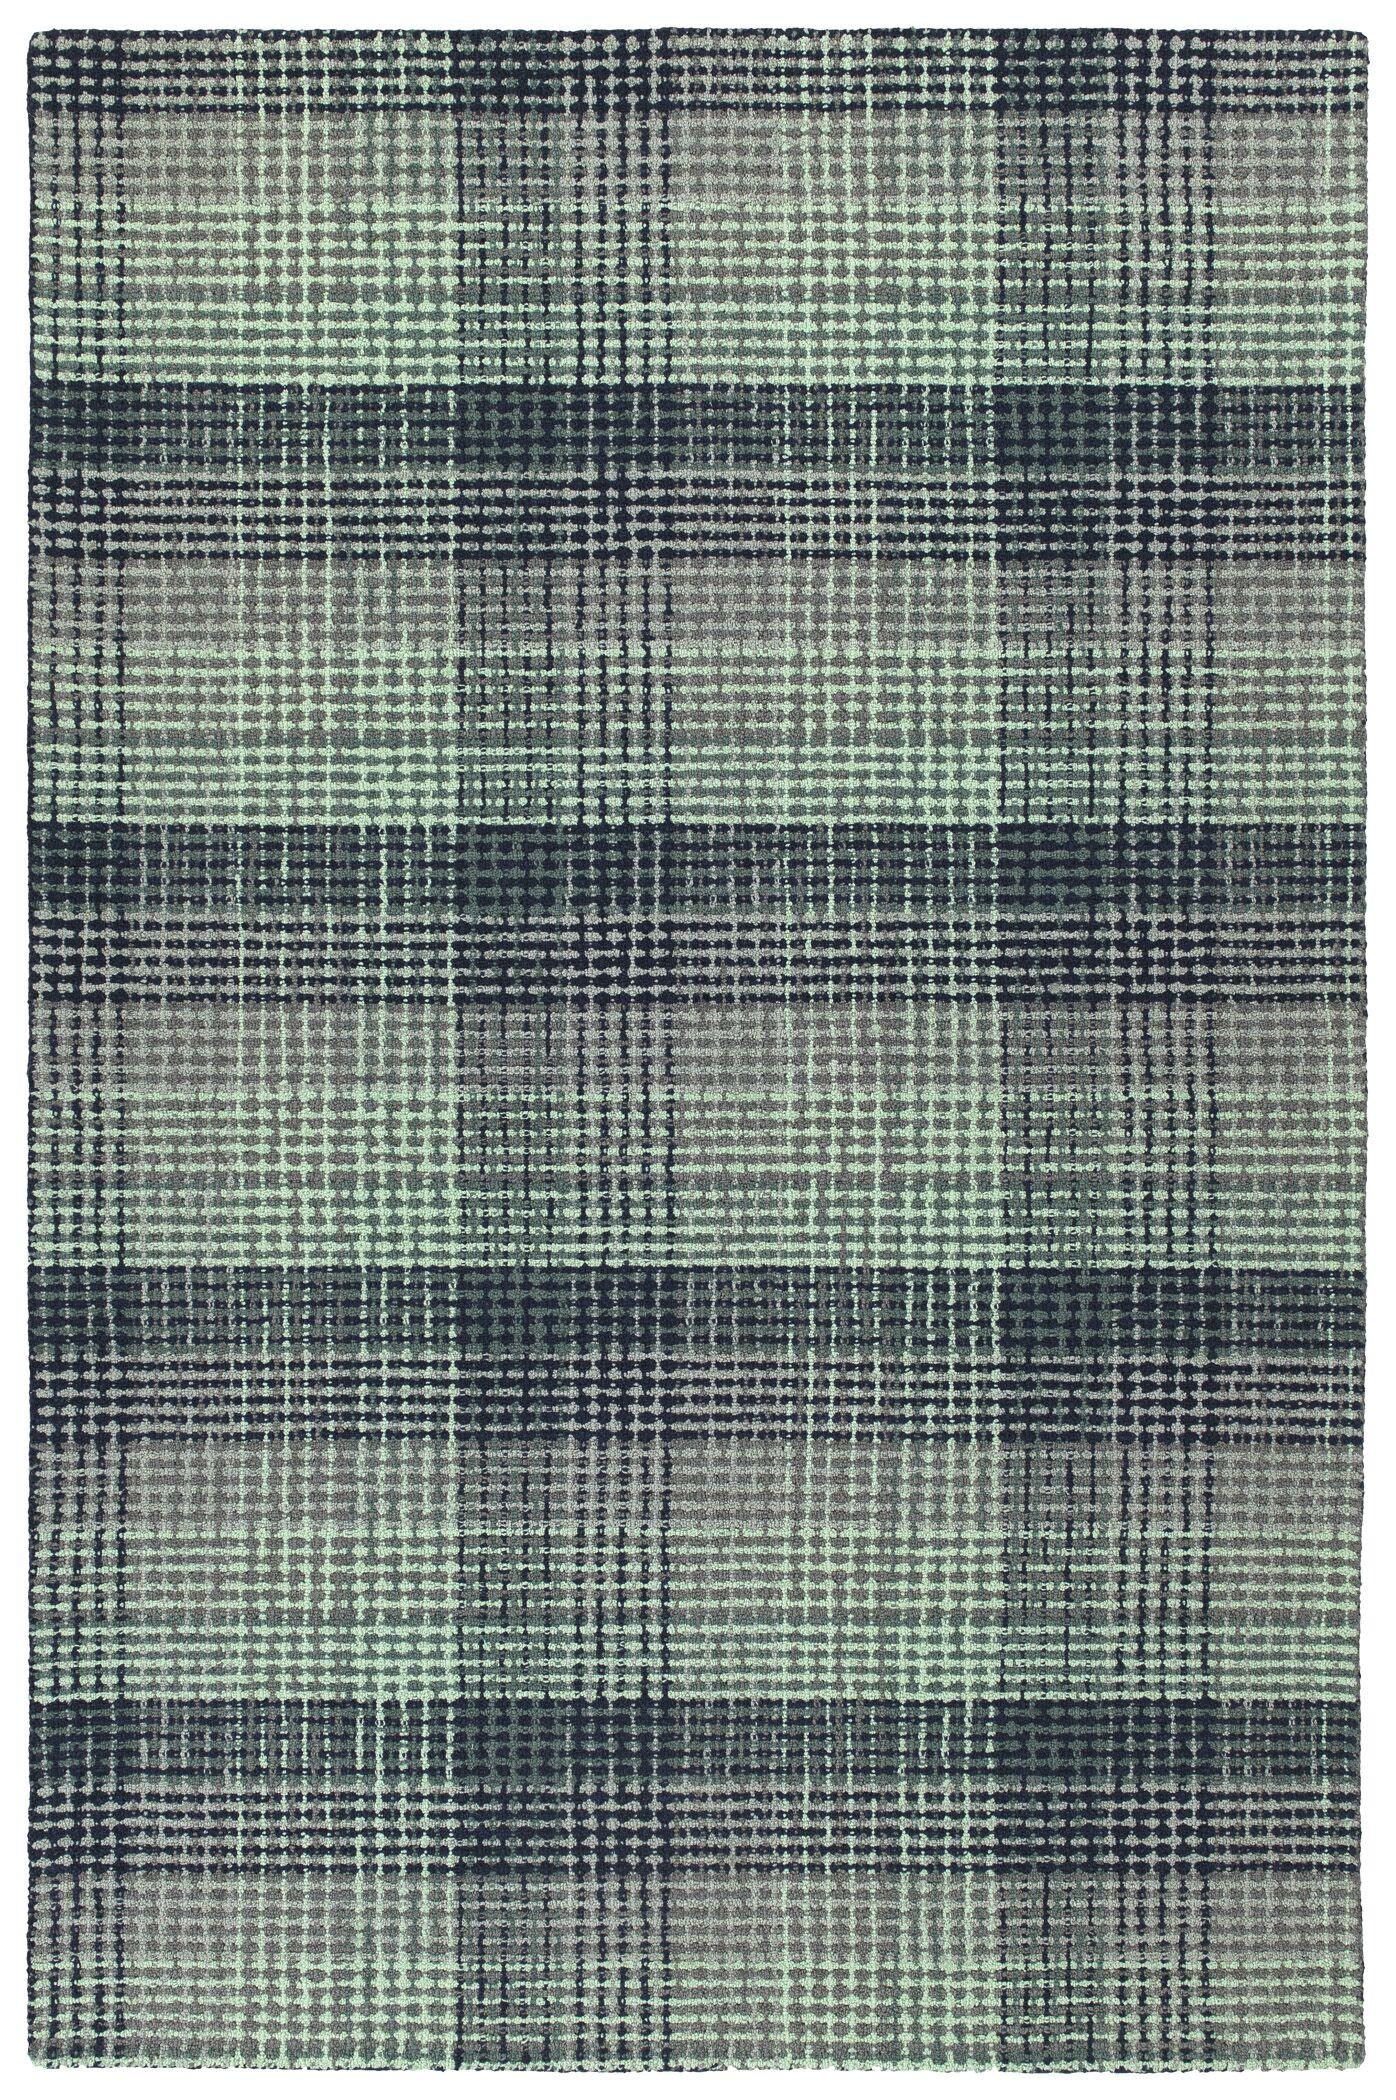 Tahsha Hand Tufted Wool Turquoise Area Rug Rug Size: Rectangle 3'6